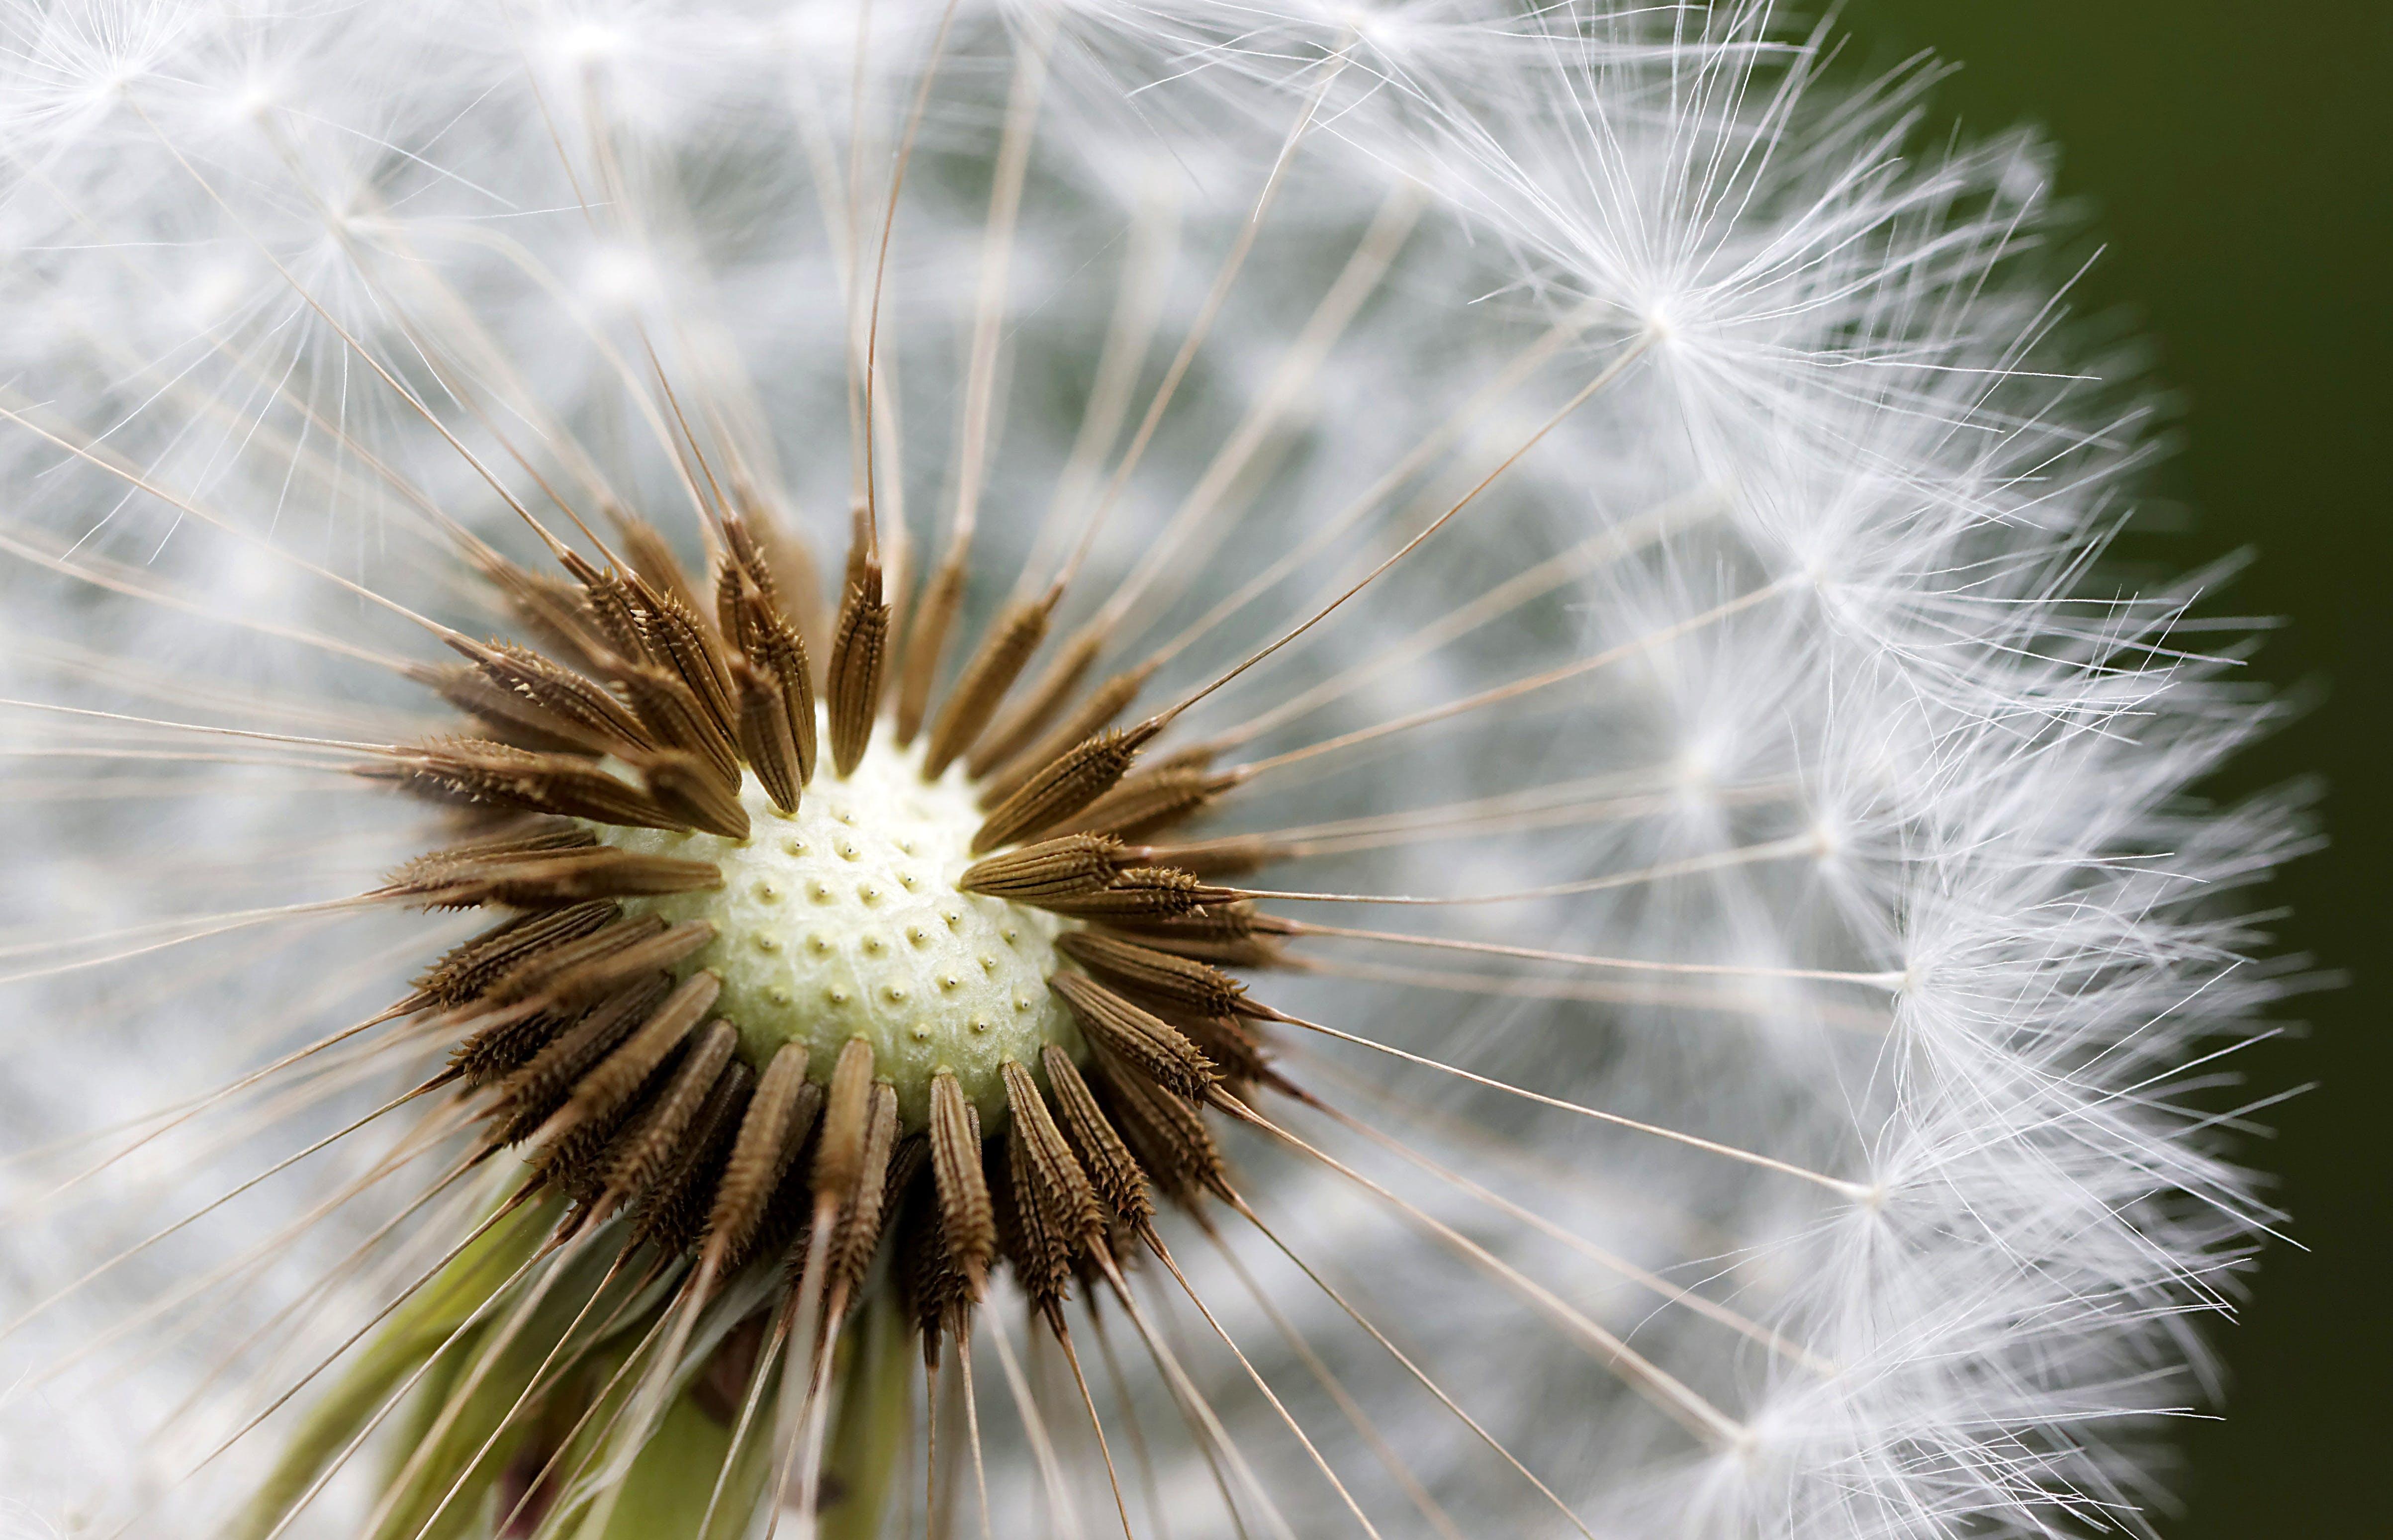 Macro Photography of White Dandelion